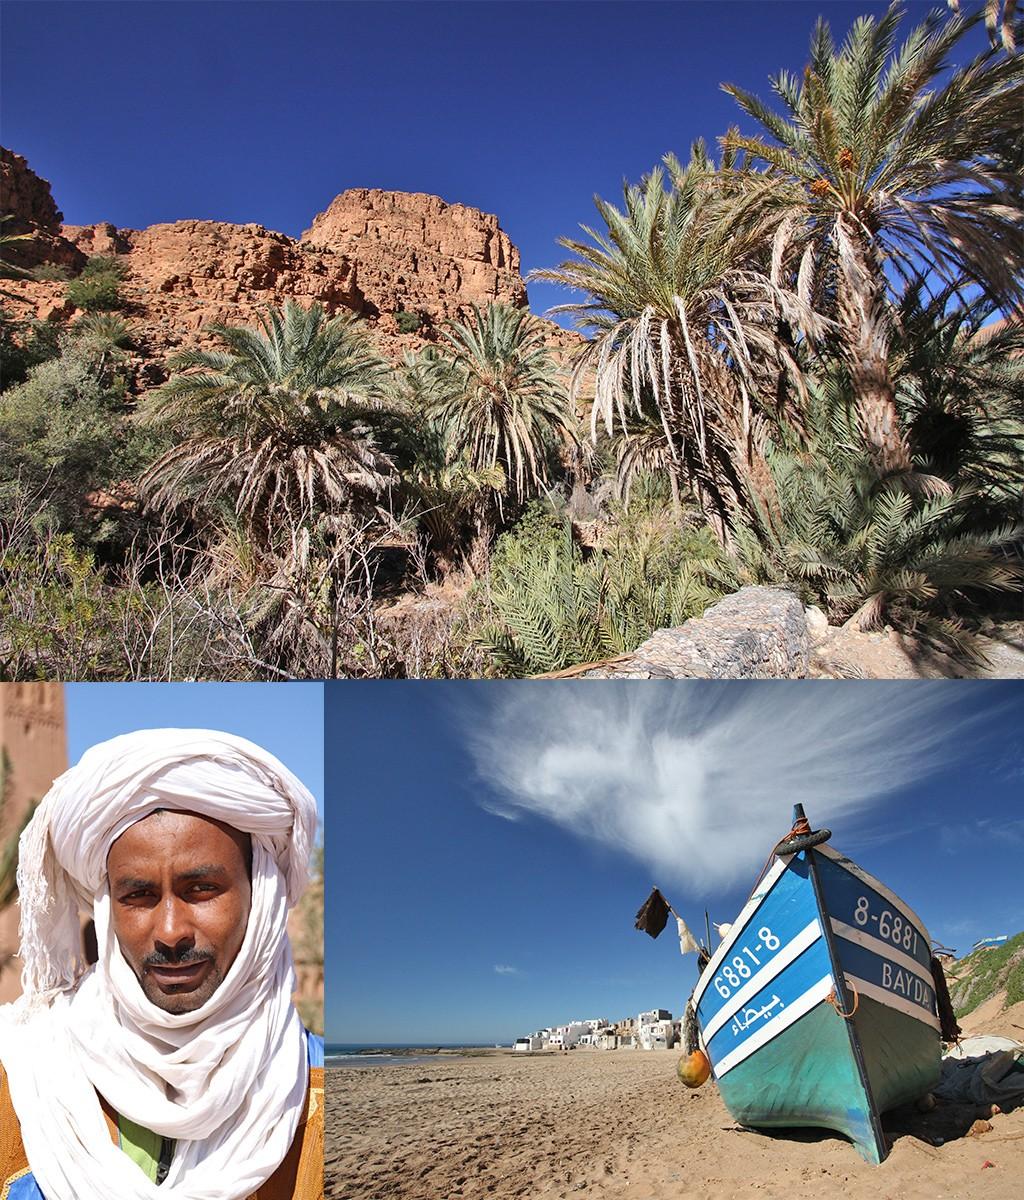 route Marokko rondreis - strand en bergen